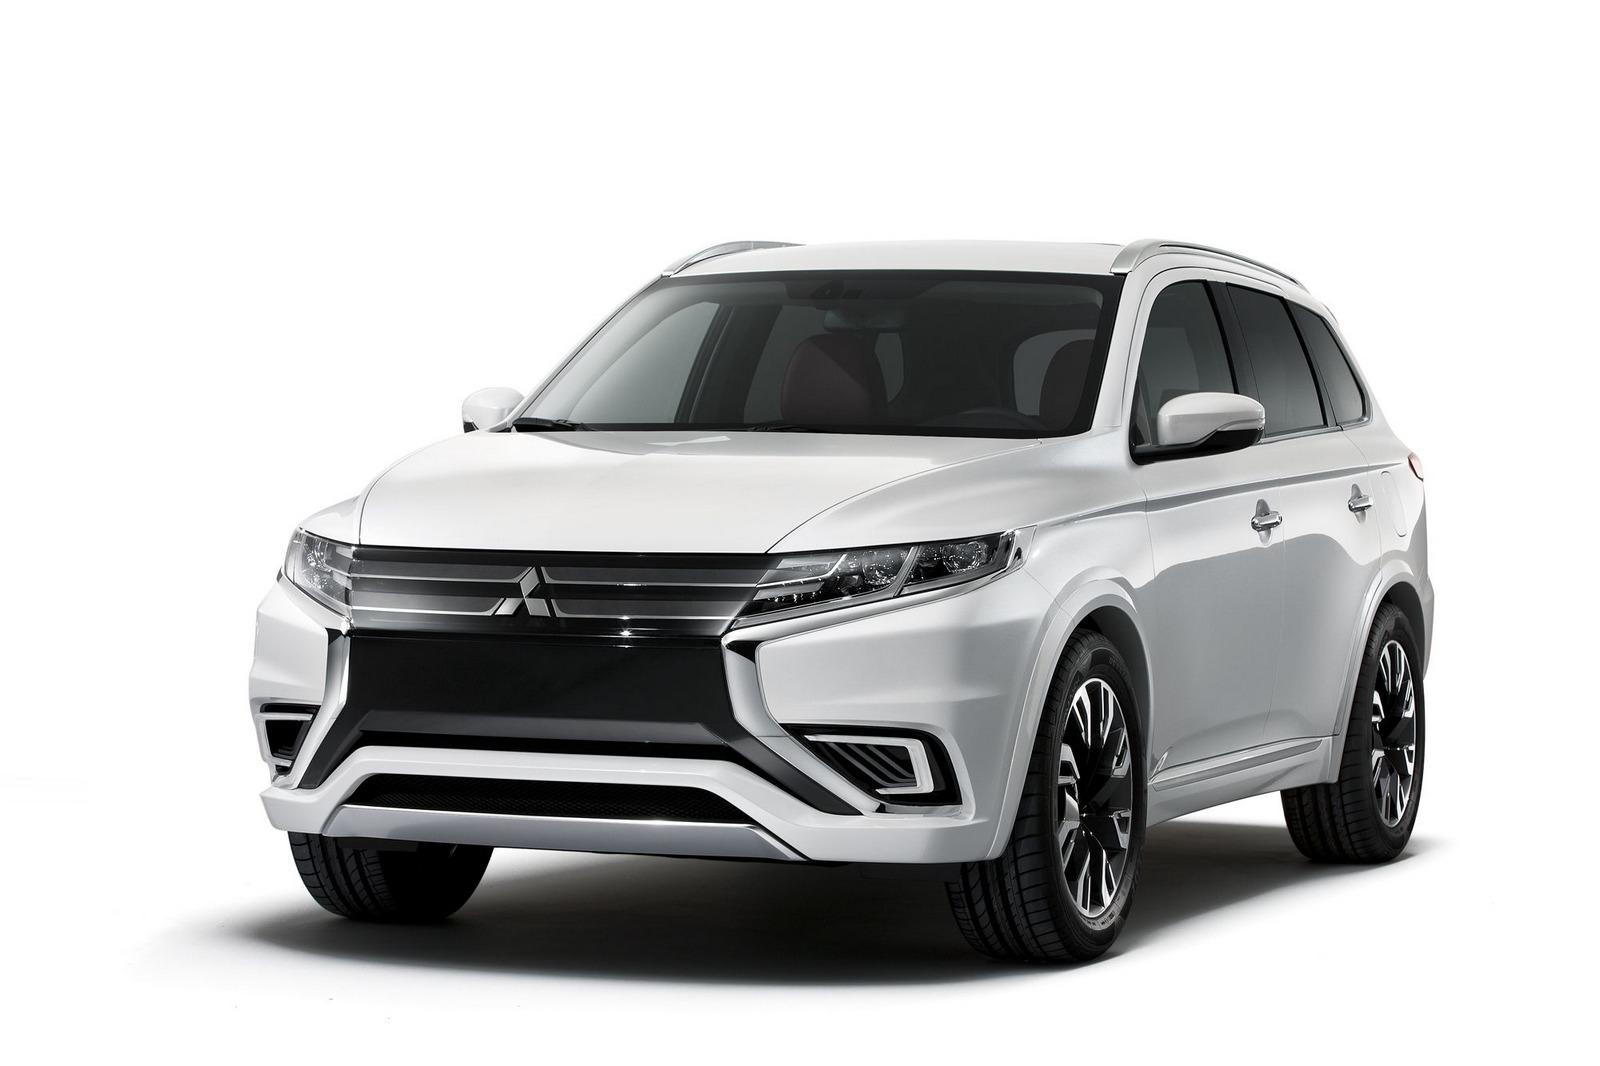 Foto de Mitsubishi Outlander PHEV Concept-S (36/49)